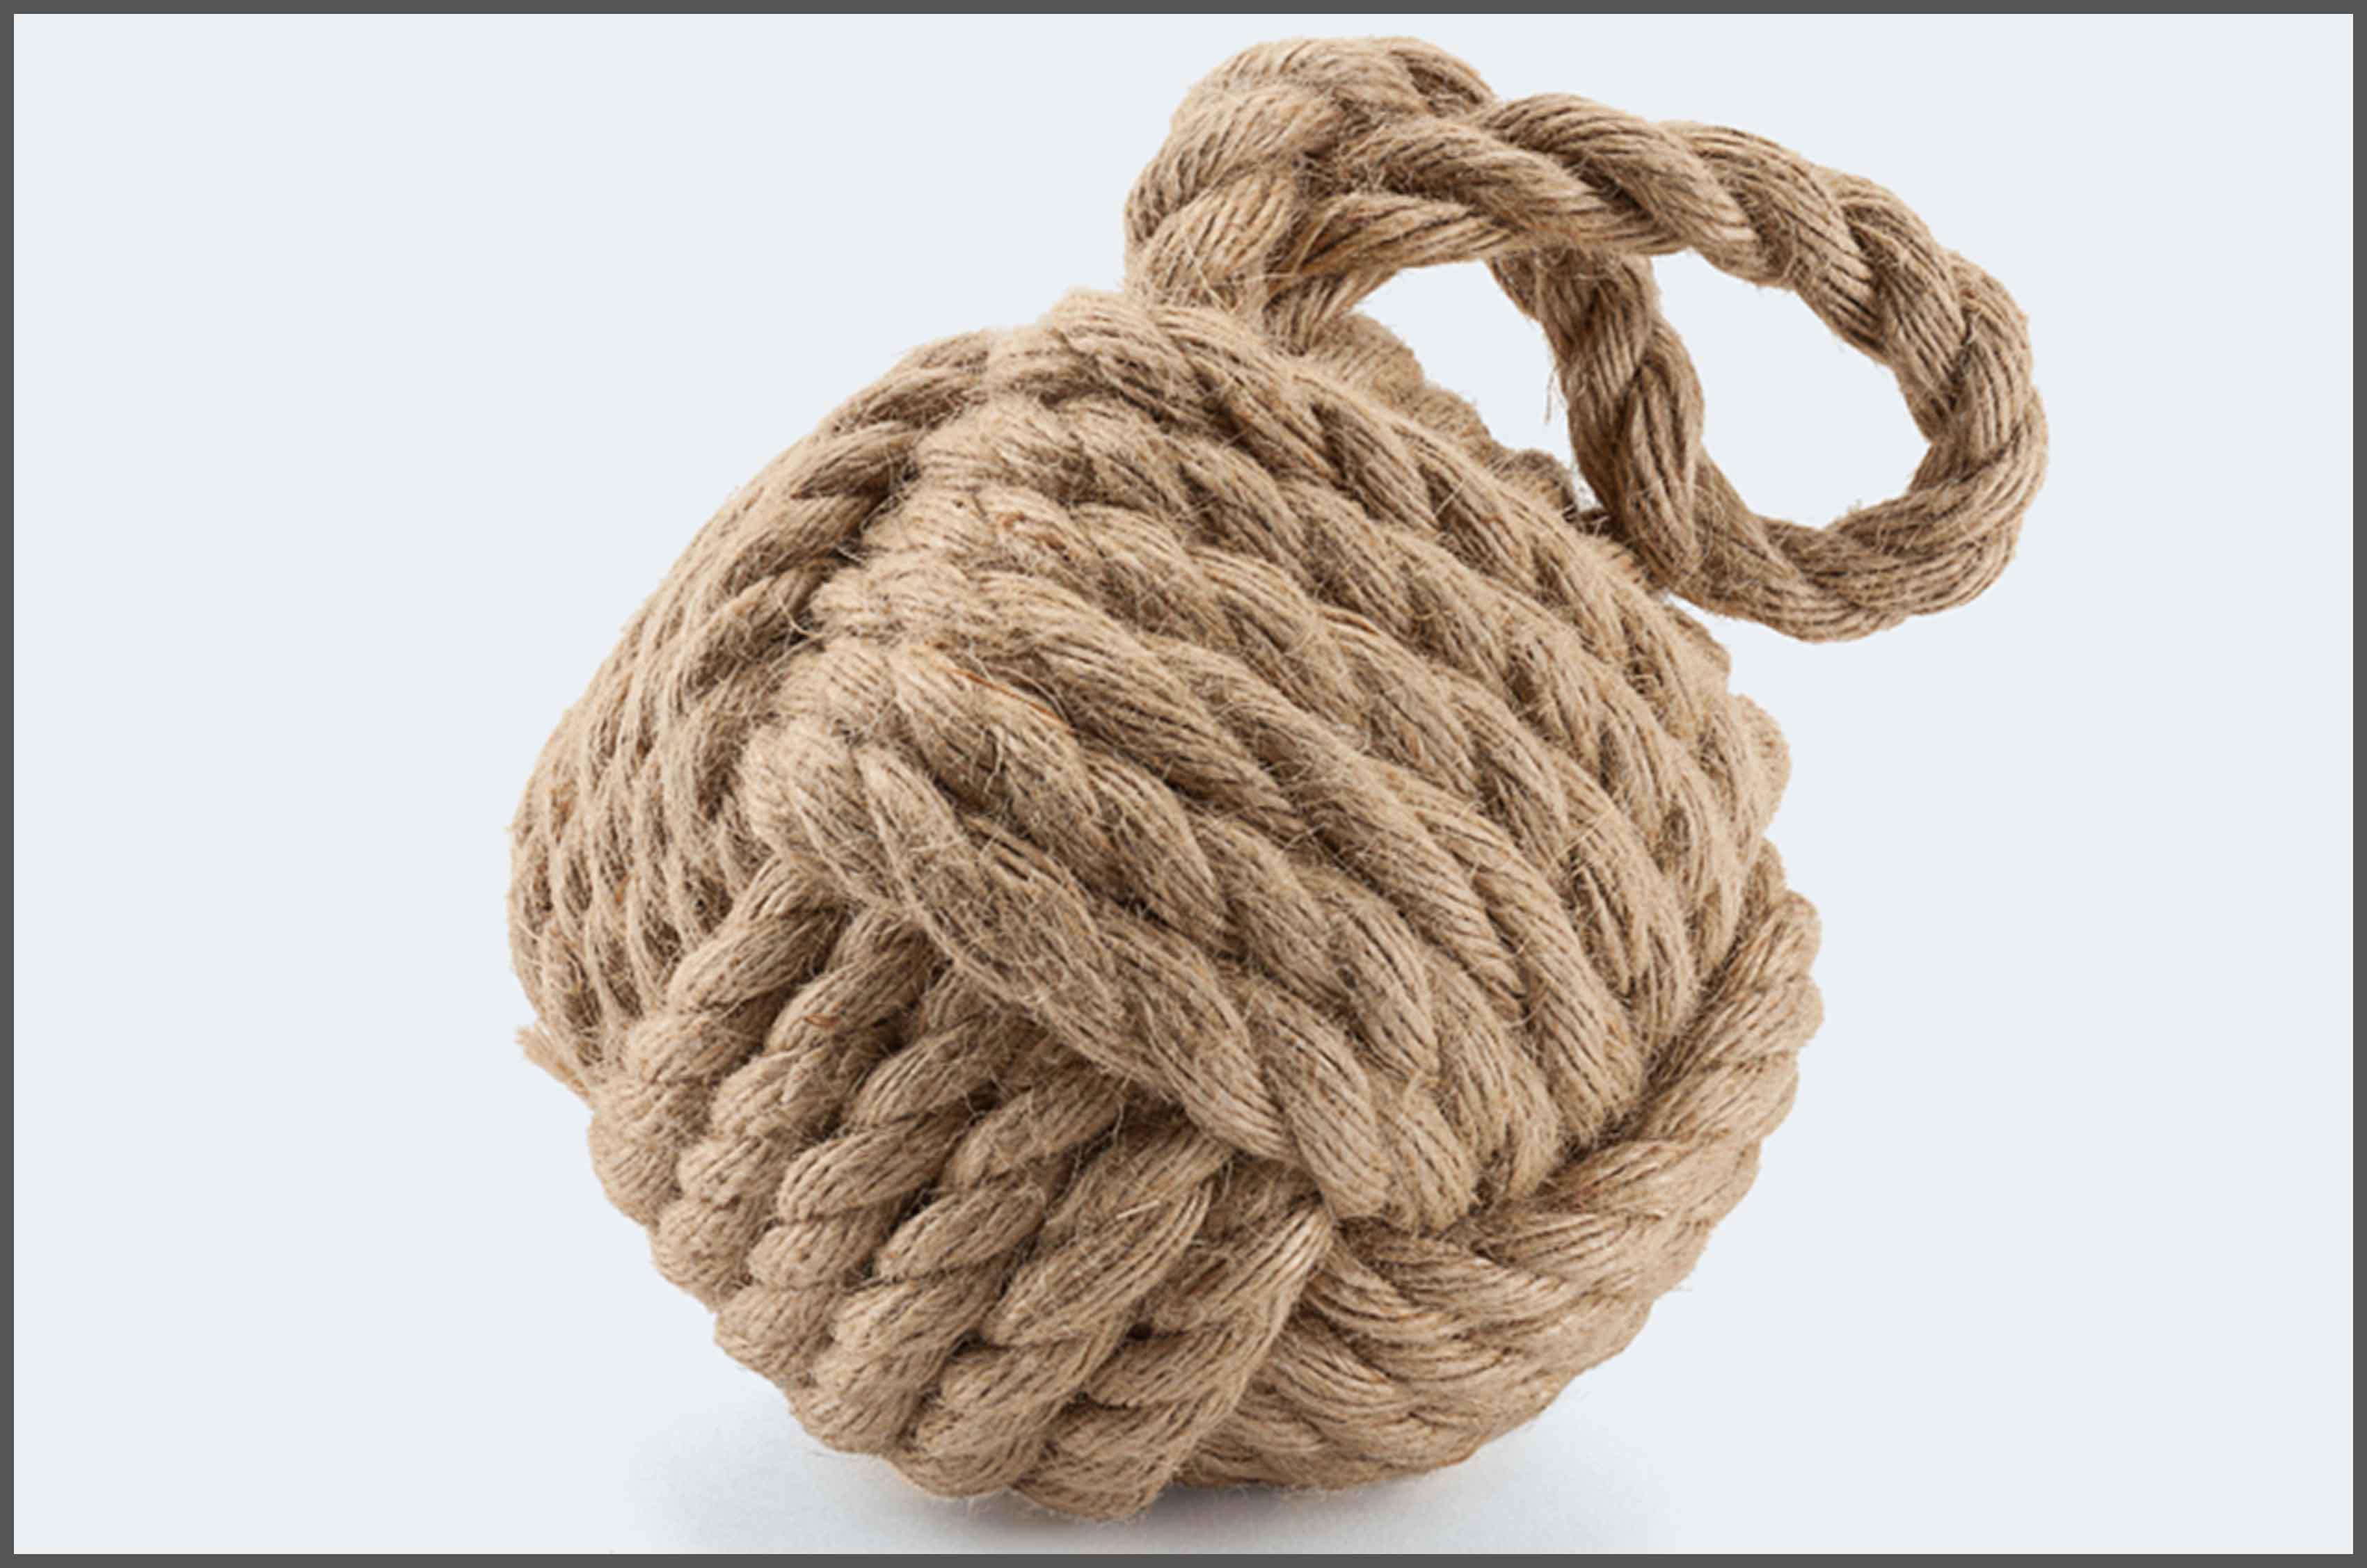 lina marynarska